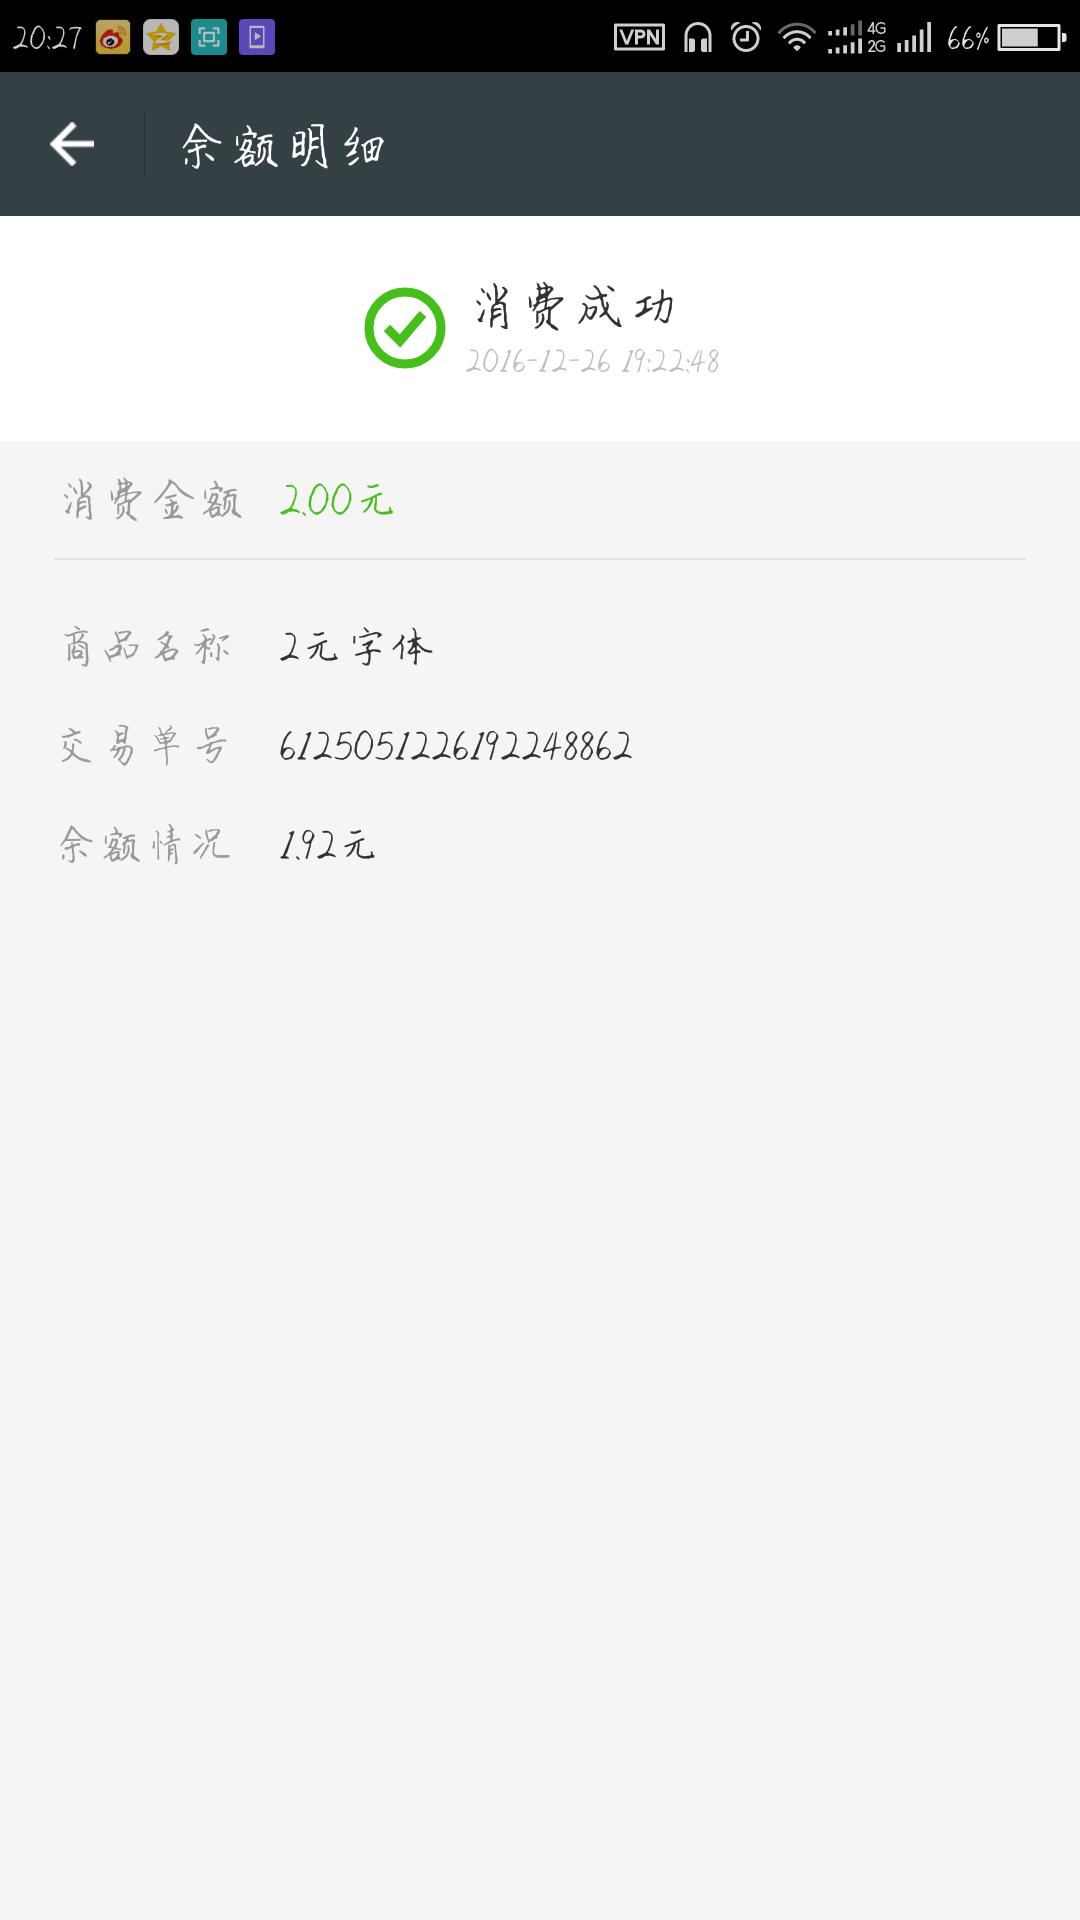 Screenshot_2016-12-28-20-27-50.png